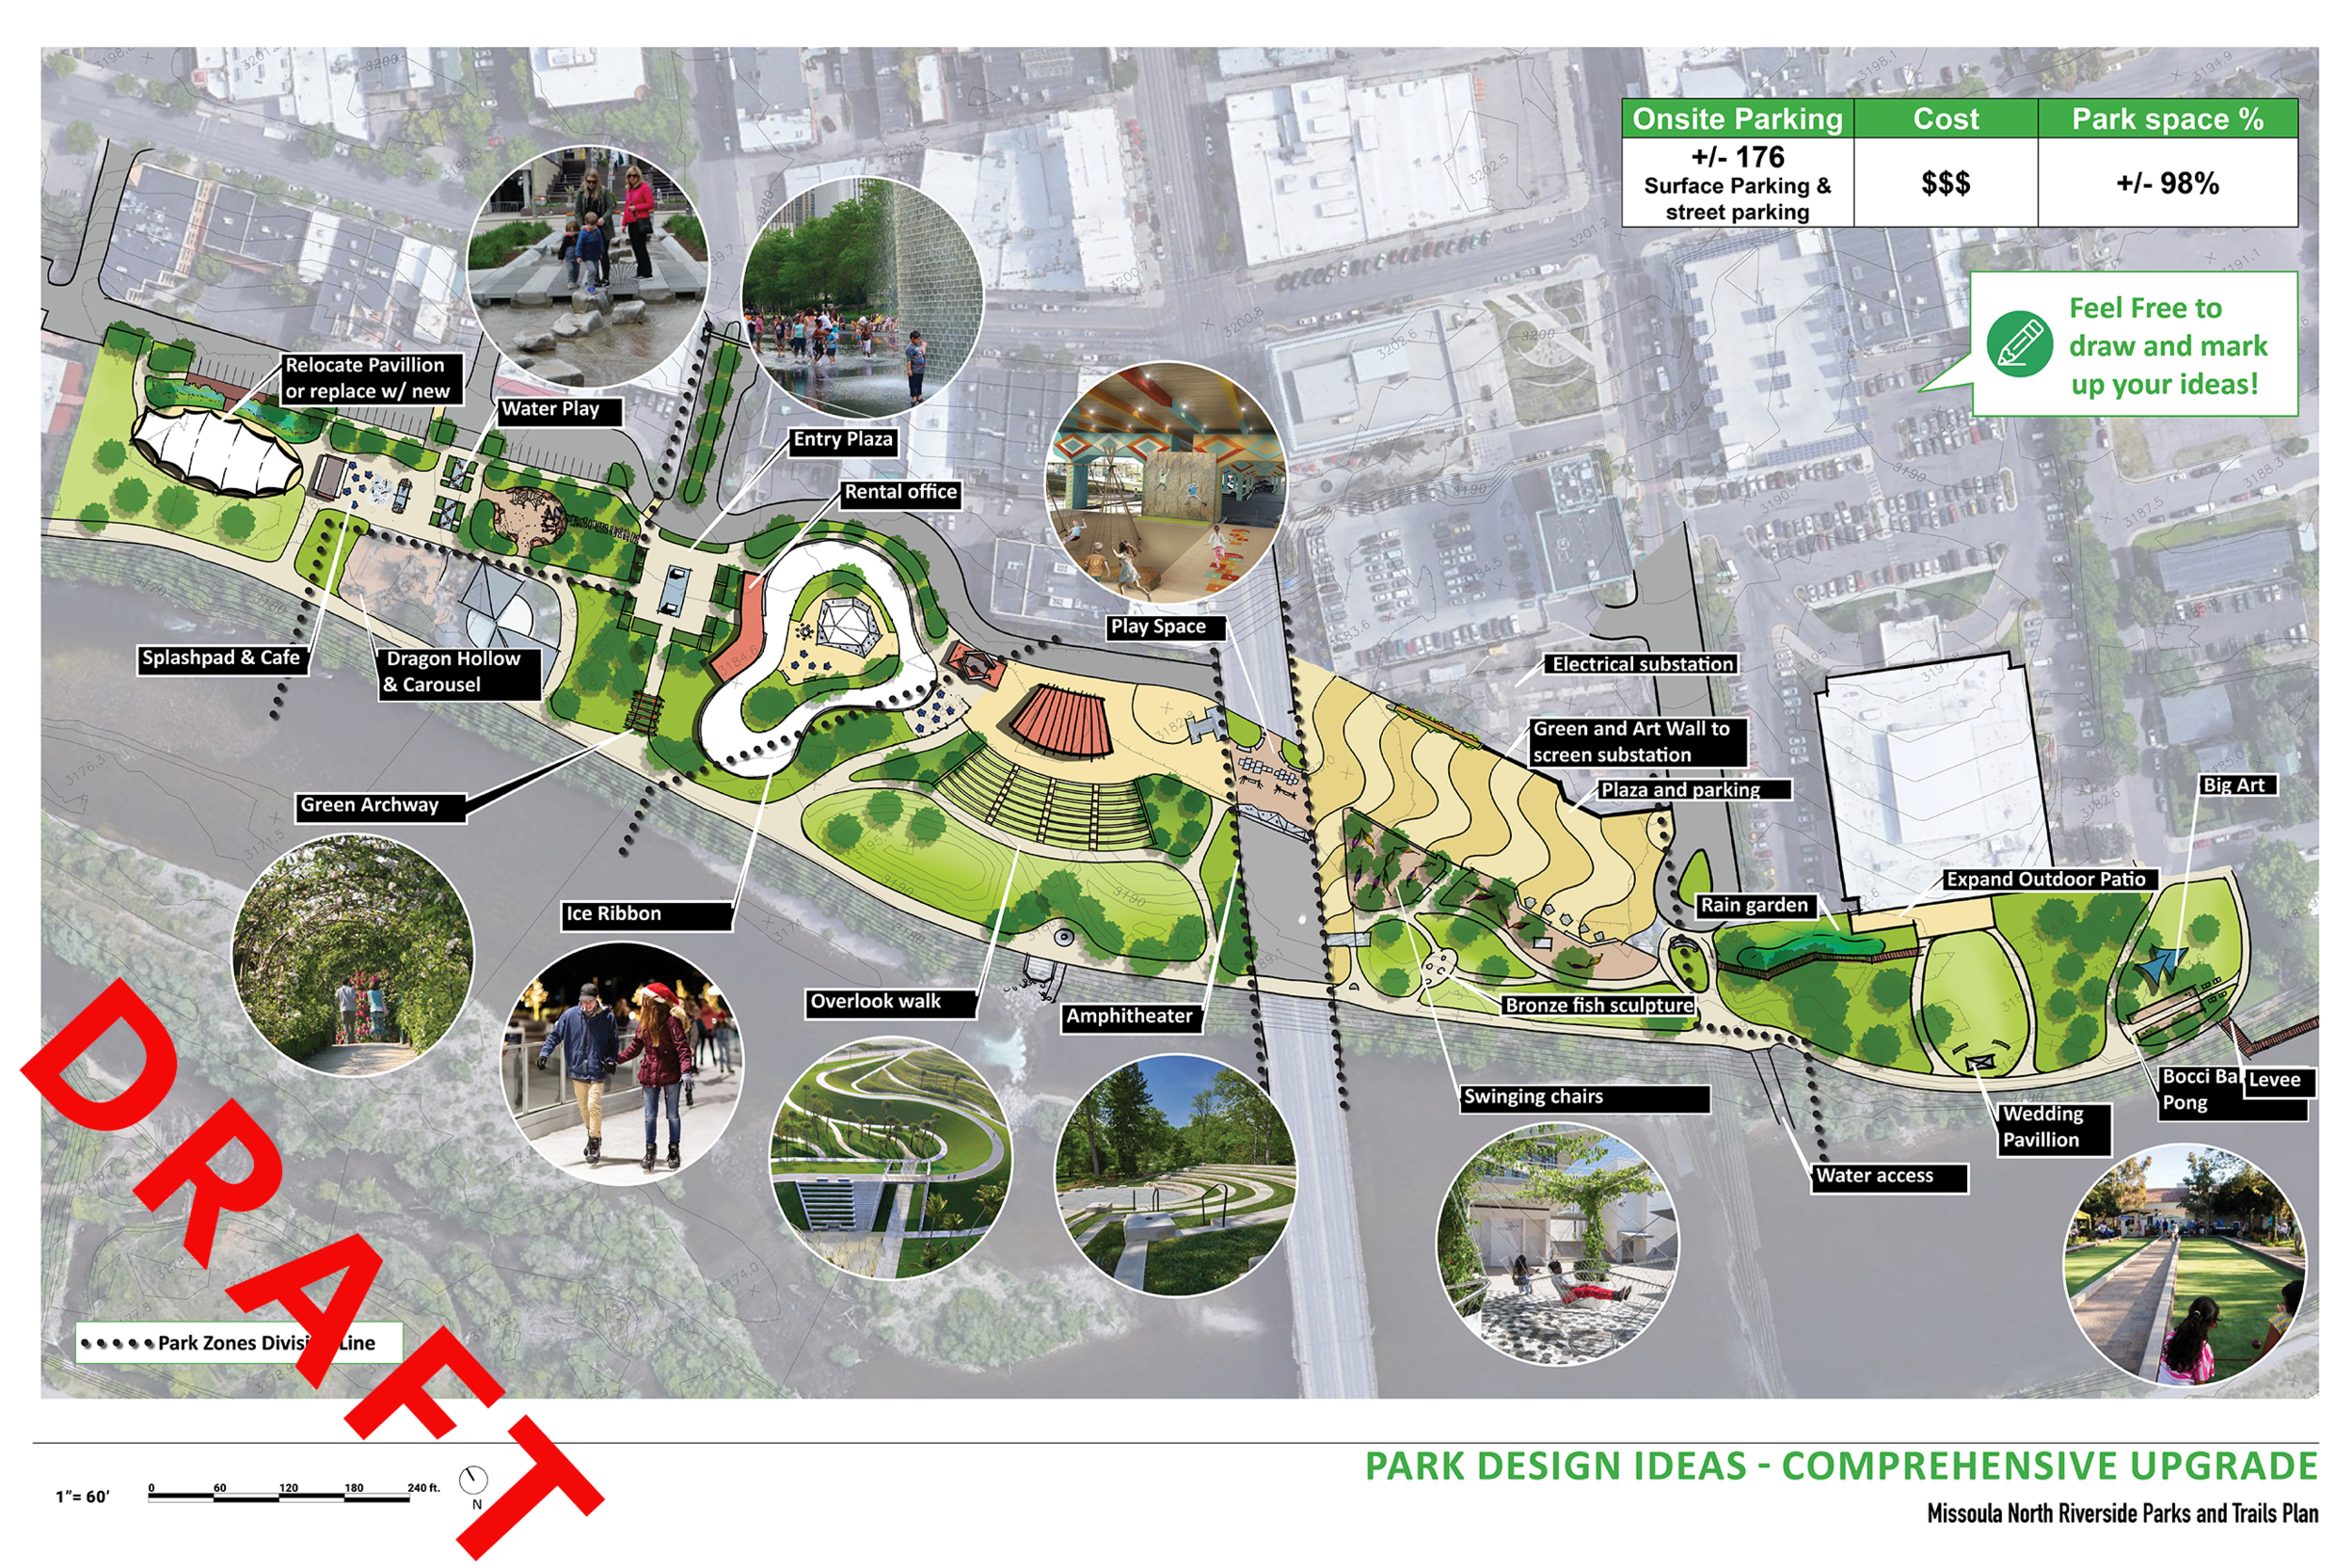 3.- Park Design Ideas - Comprehensive Upgrade